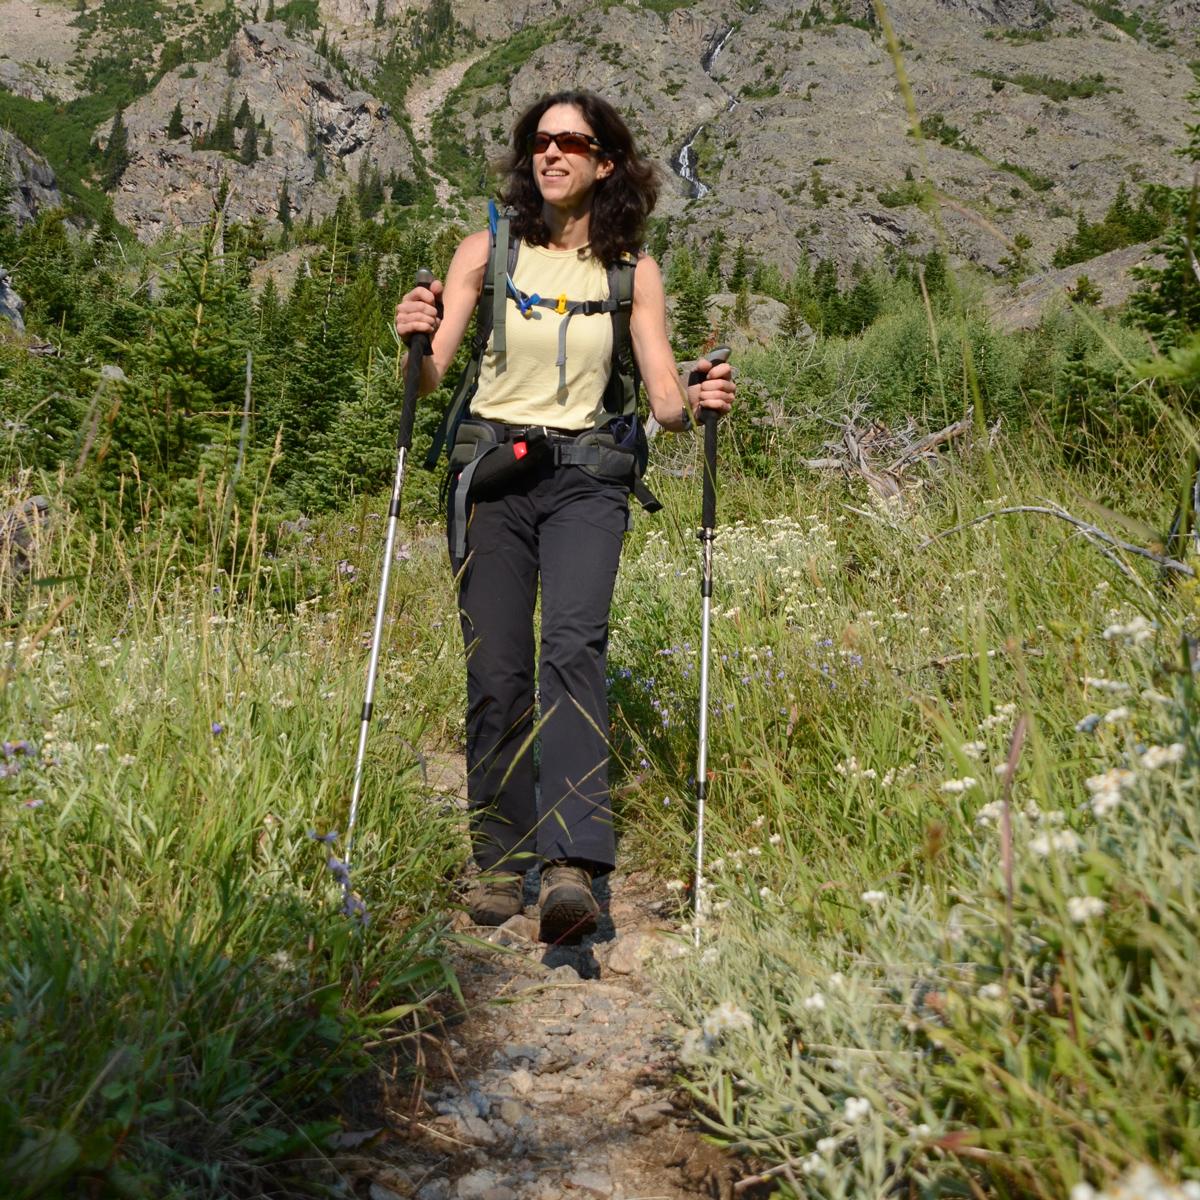 JBallard_MT-Beartooth-Absaroka-Wilderness_Hiking,-Lisa-Densmore